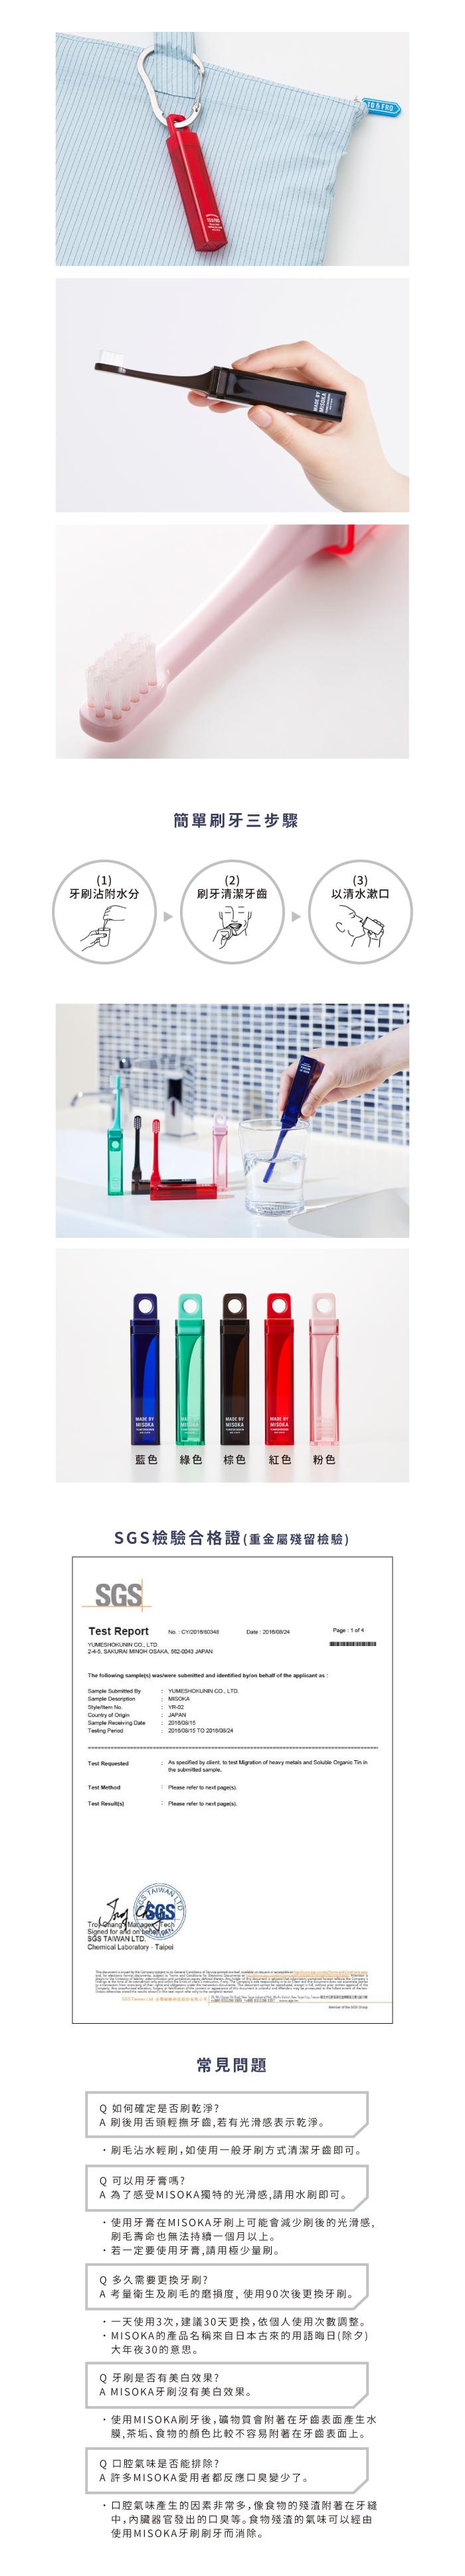 MISOKA │ 免牙膏旅行牙刷 (日本製 / 棕色)